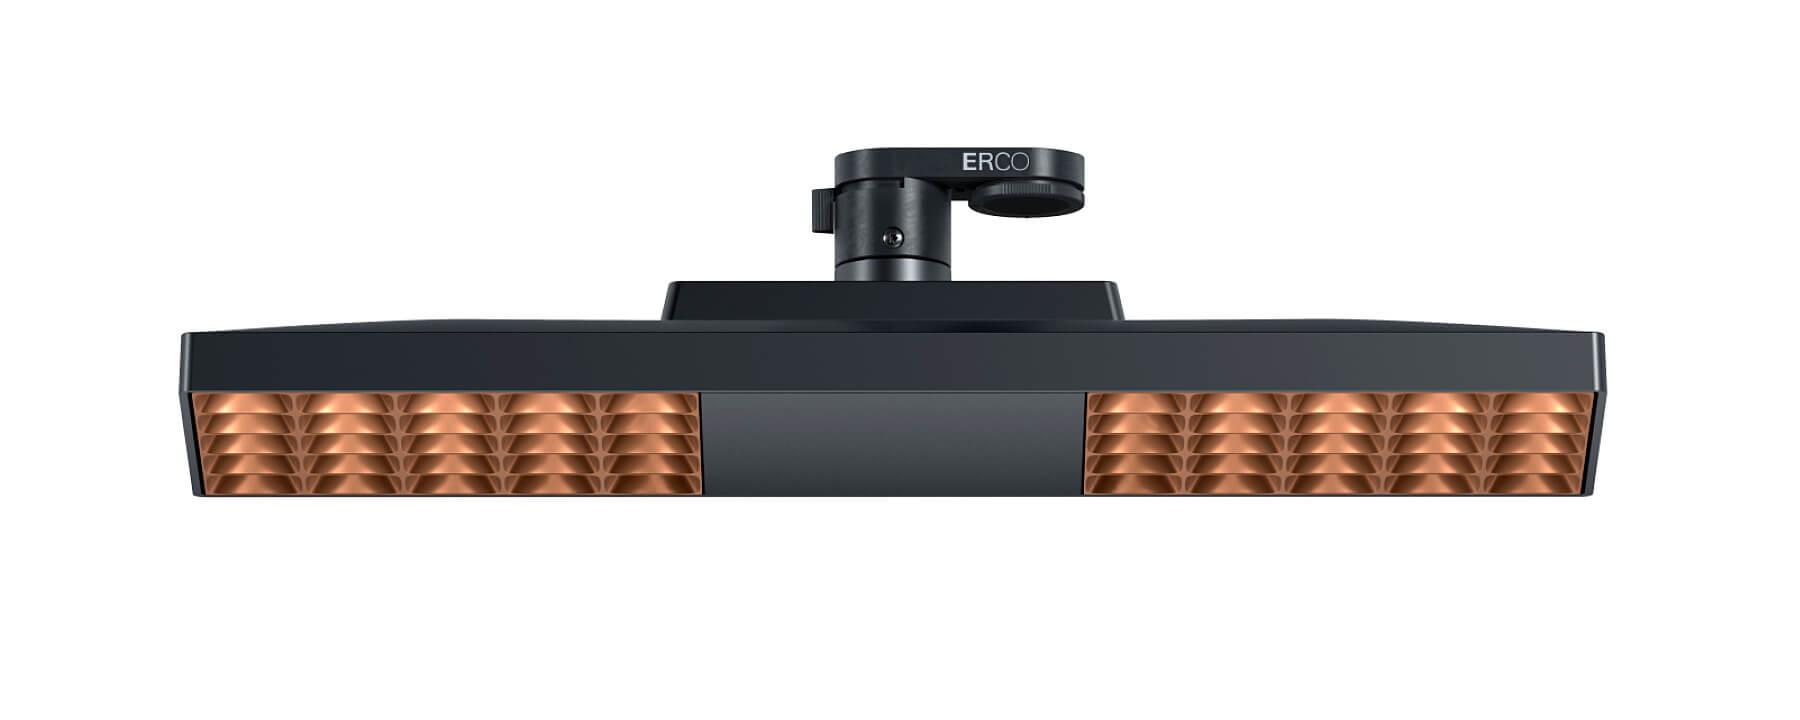 ERCO lighting product Jilly